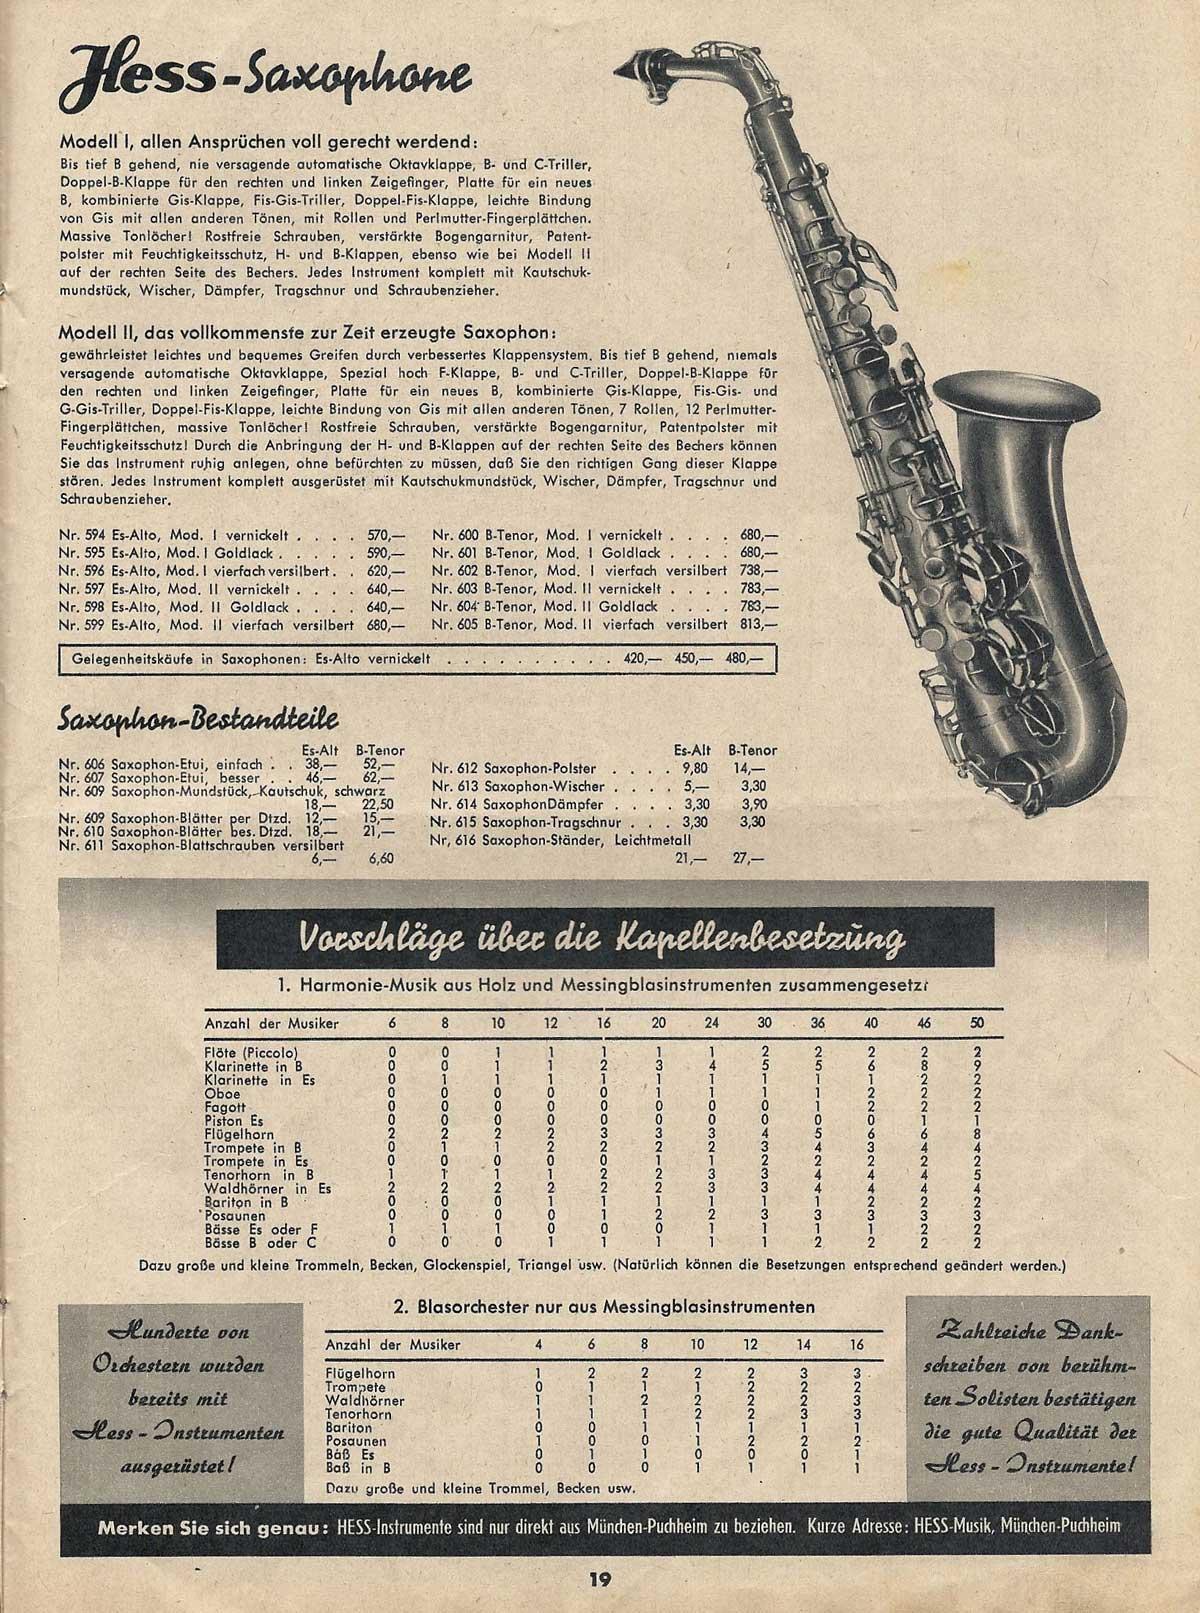 vintage musical instrument catalogue, Ernst Hess, Hess saxophones, 1950, West German saxophone,